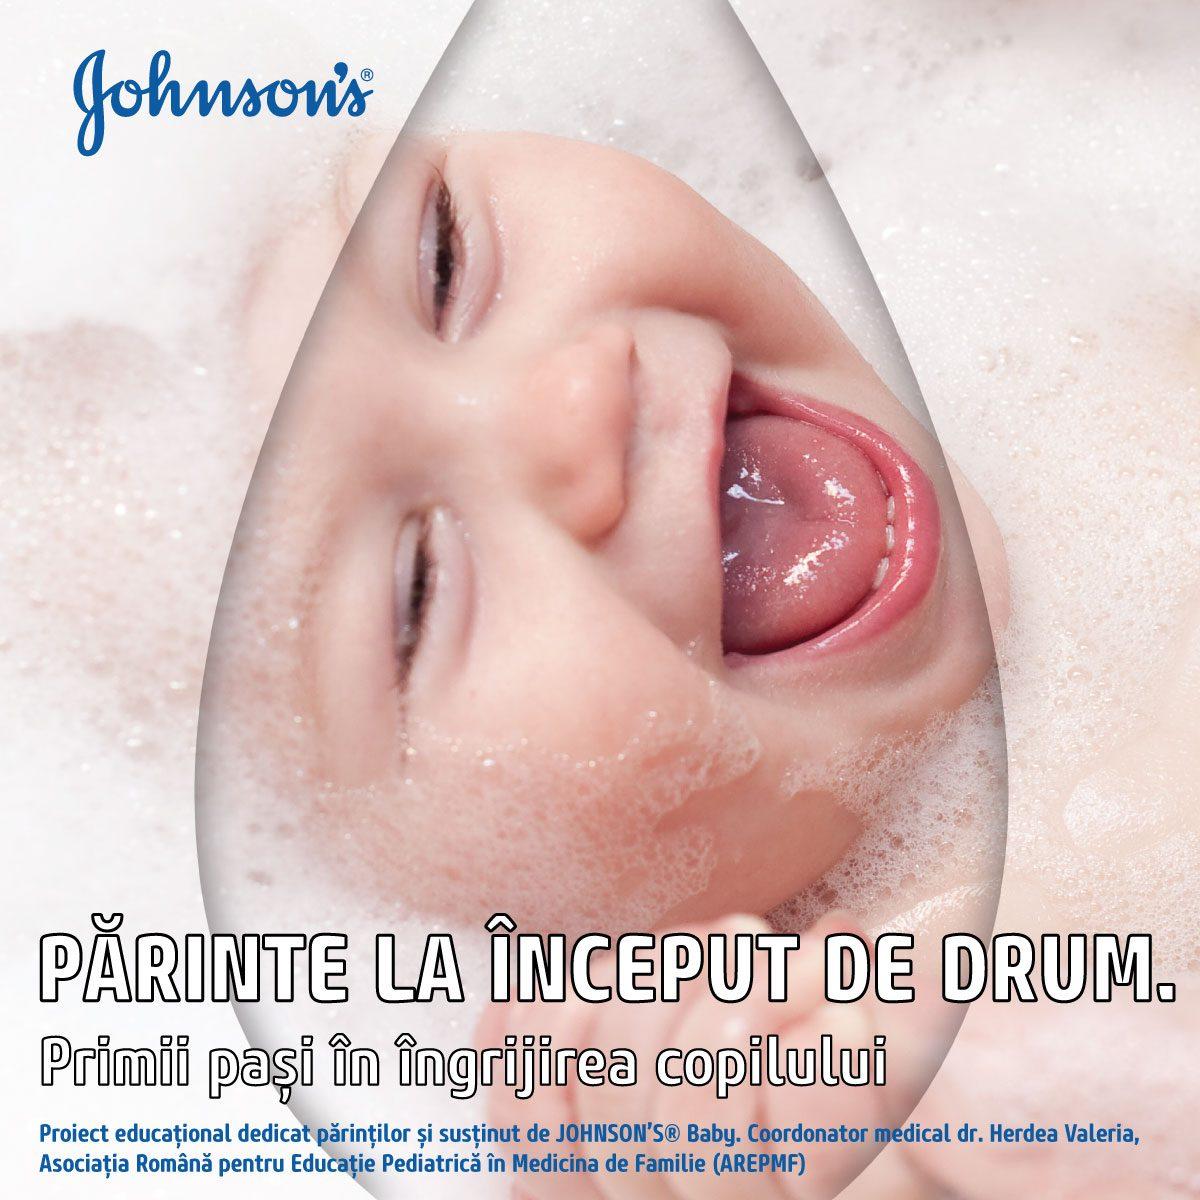 Johnson's®Baby lanseaza in Romania un ebook despre igiena si ingrijirea bebelusilor